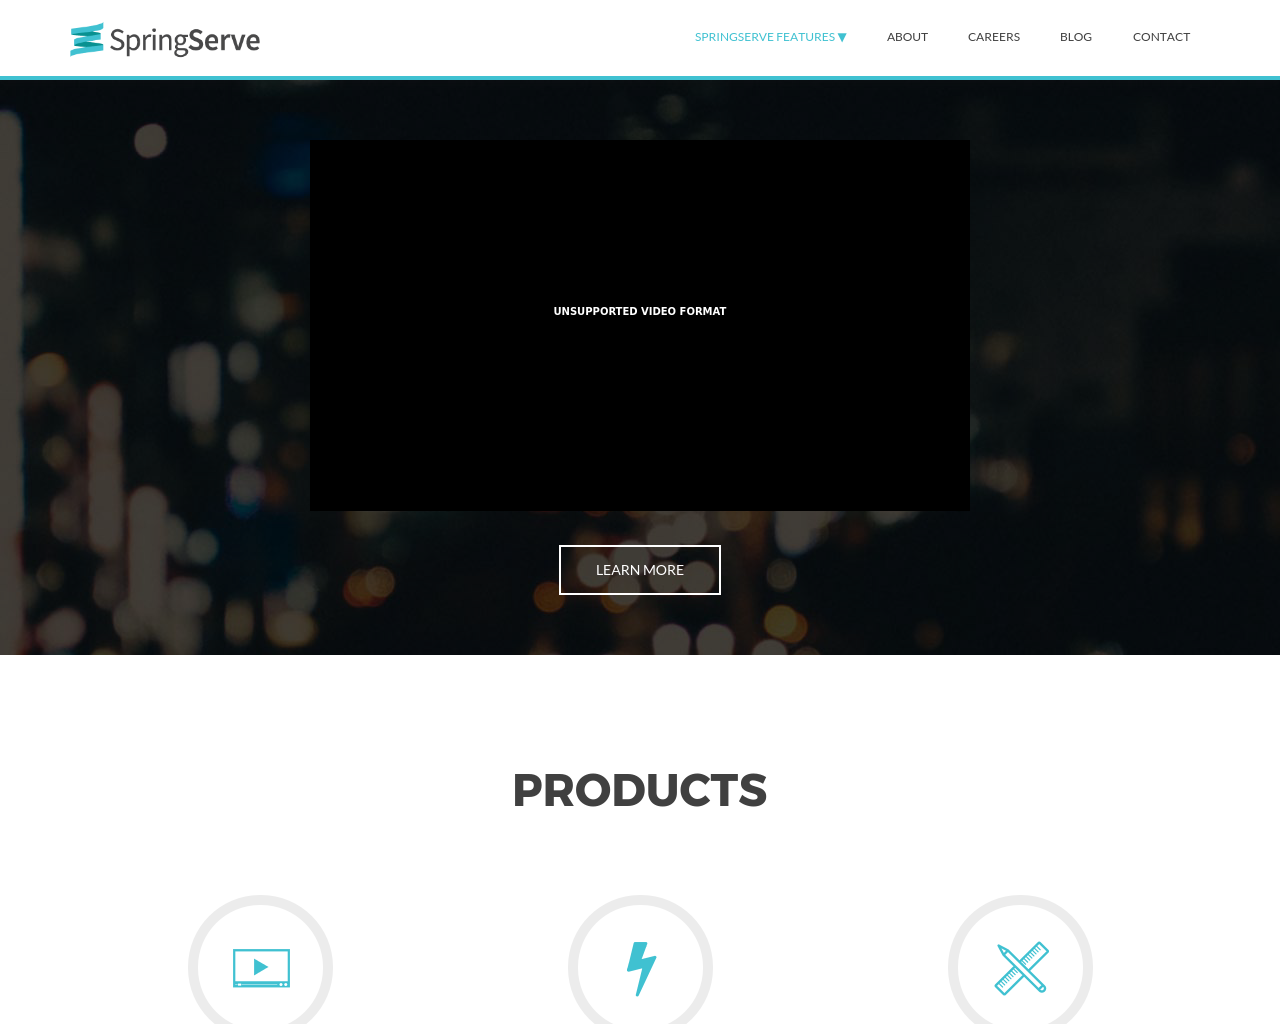 SpringServe-Advertising-Reviews-Pricing